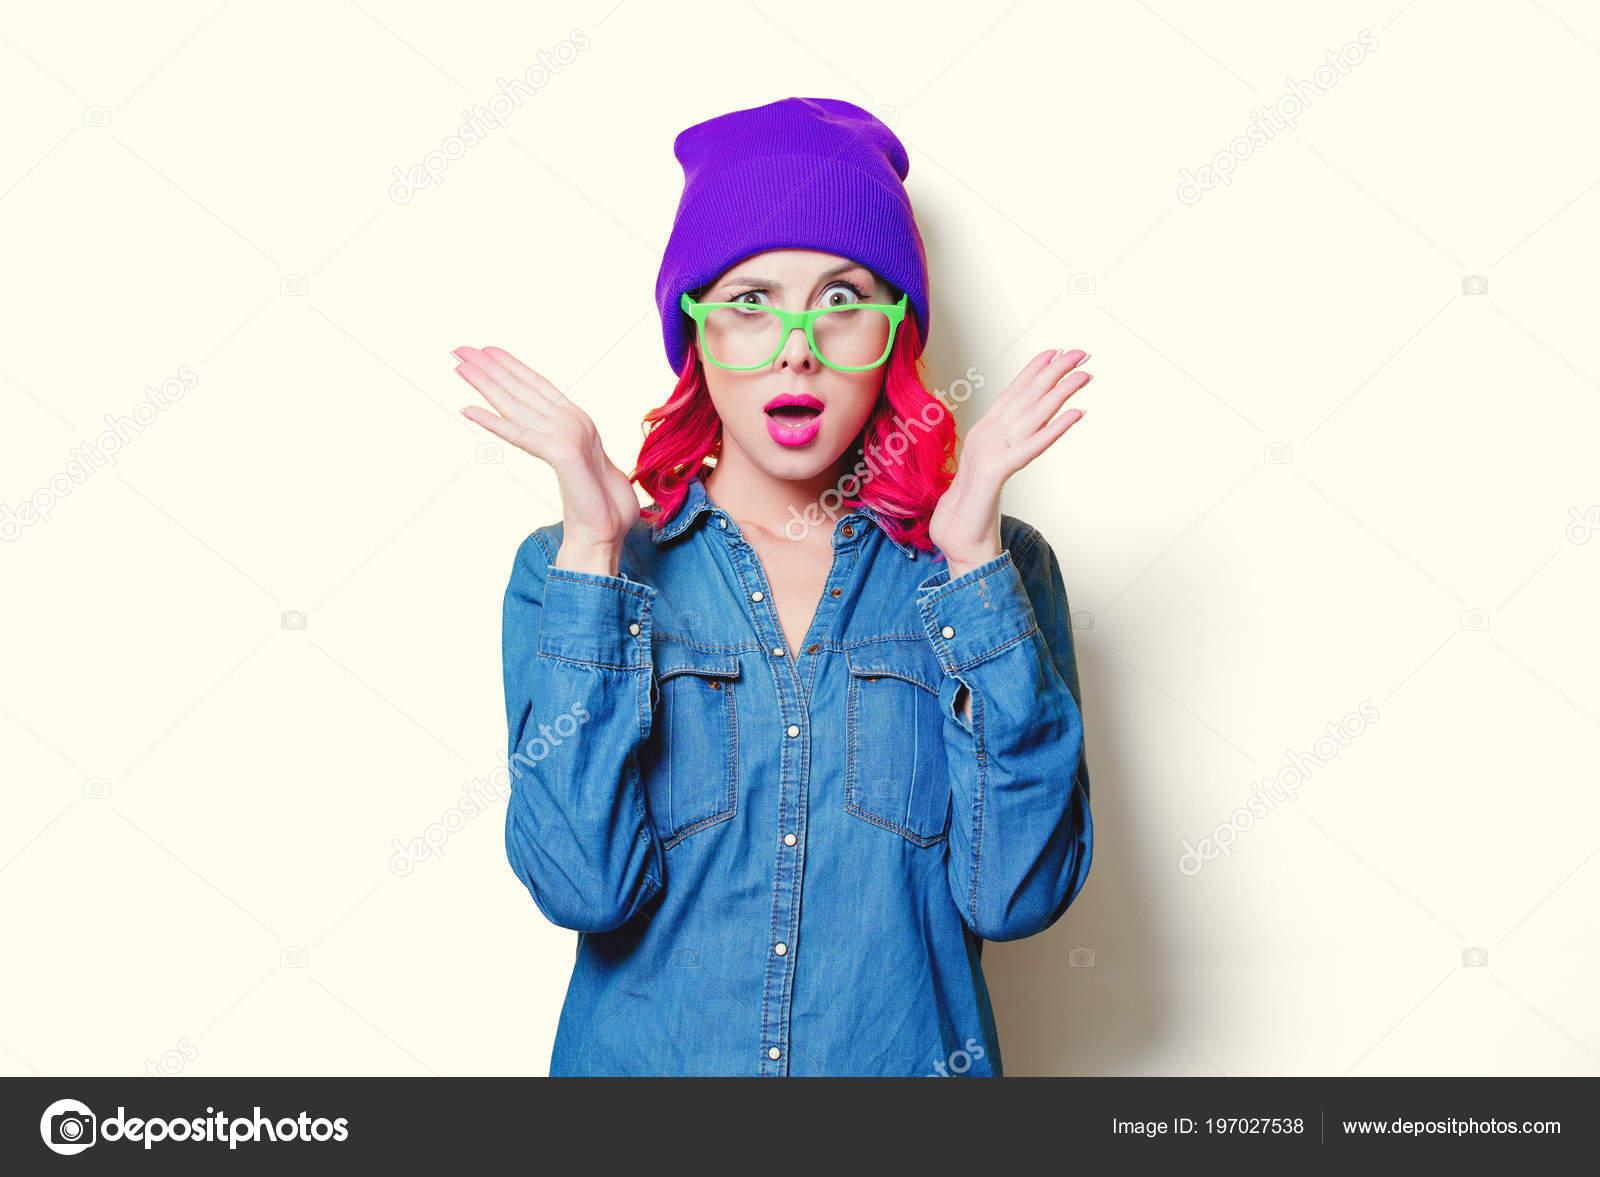 Y Gafas De Camisa Chica AzulPúrpura Verde Sombrero clK1JF